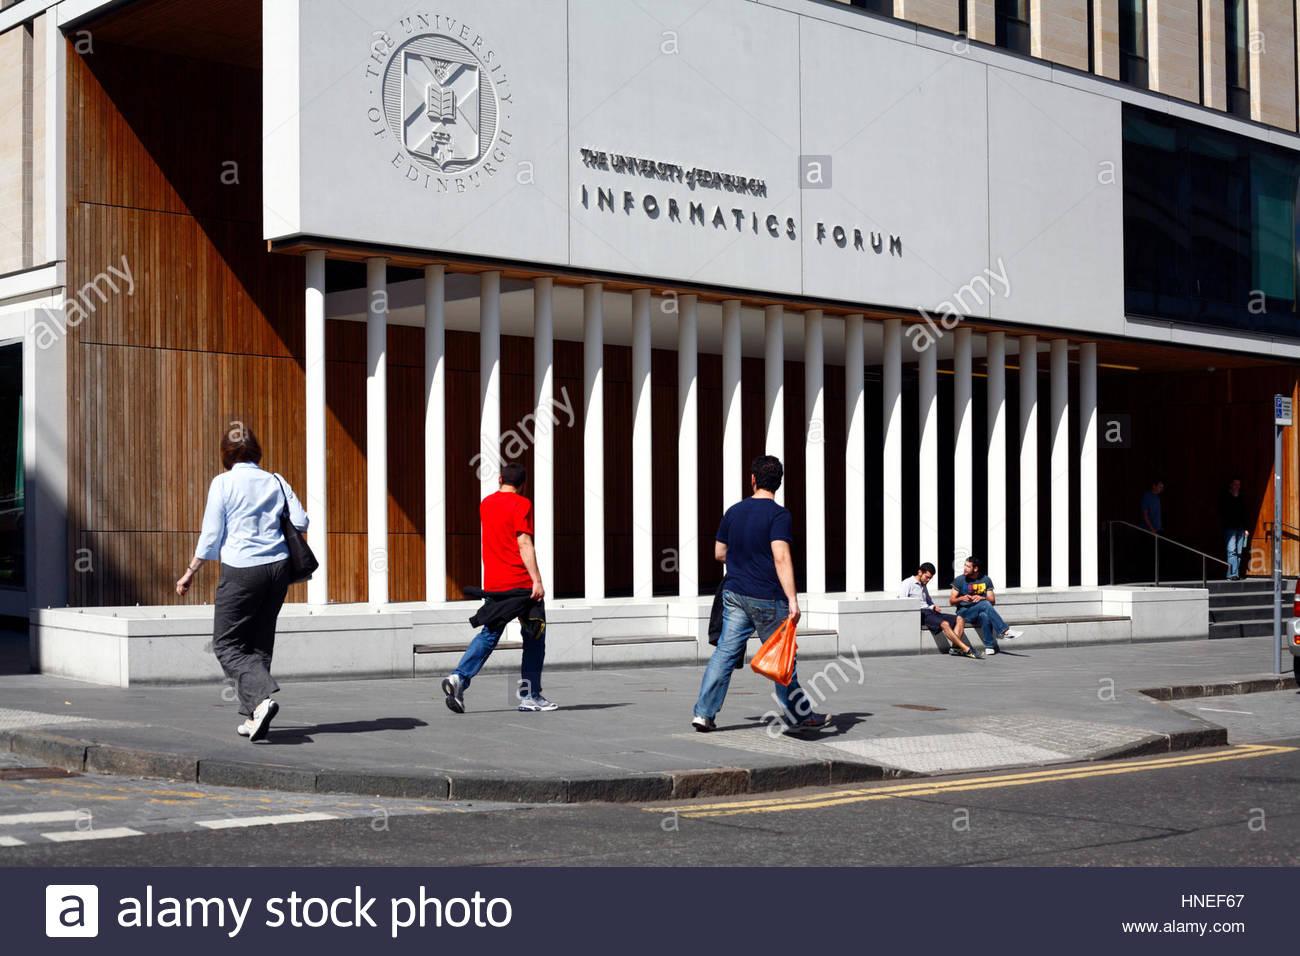 Informatics Forum building, Edinburgh University - Stock Image